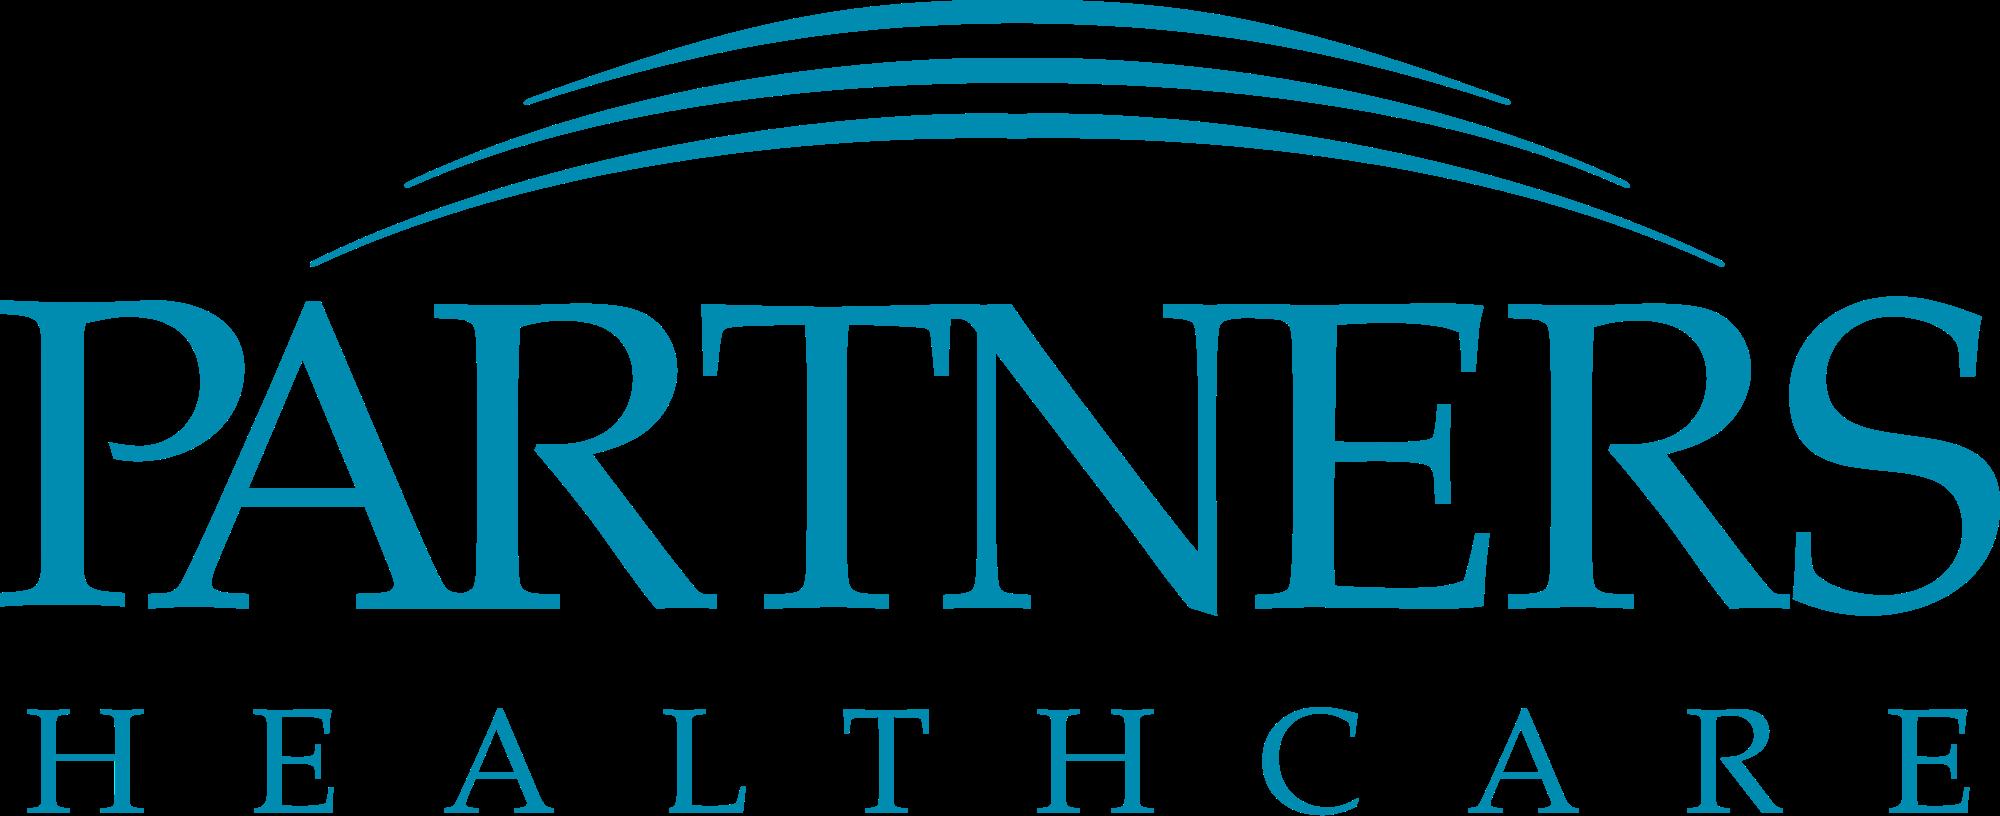 partners large logo.png